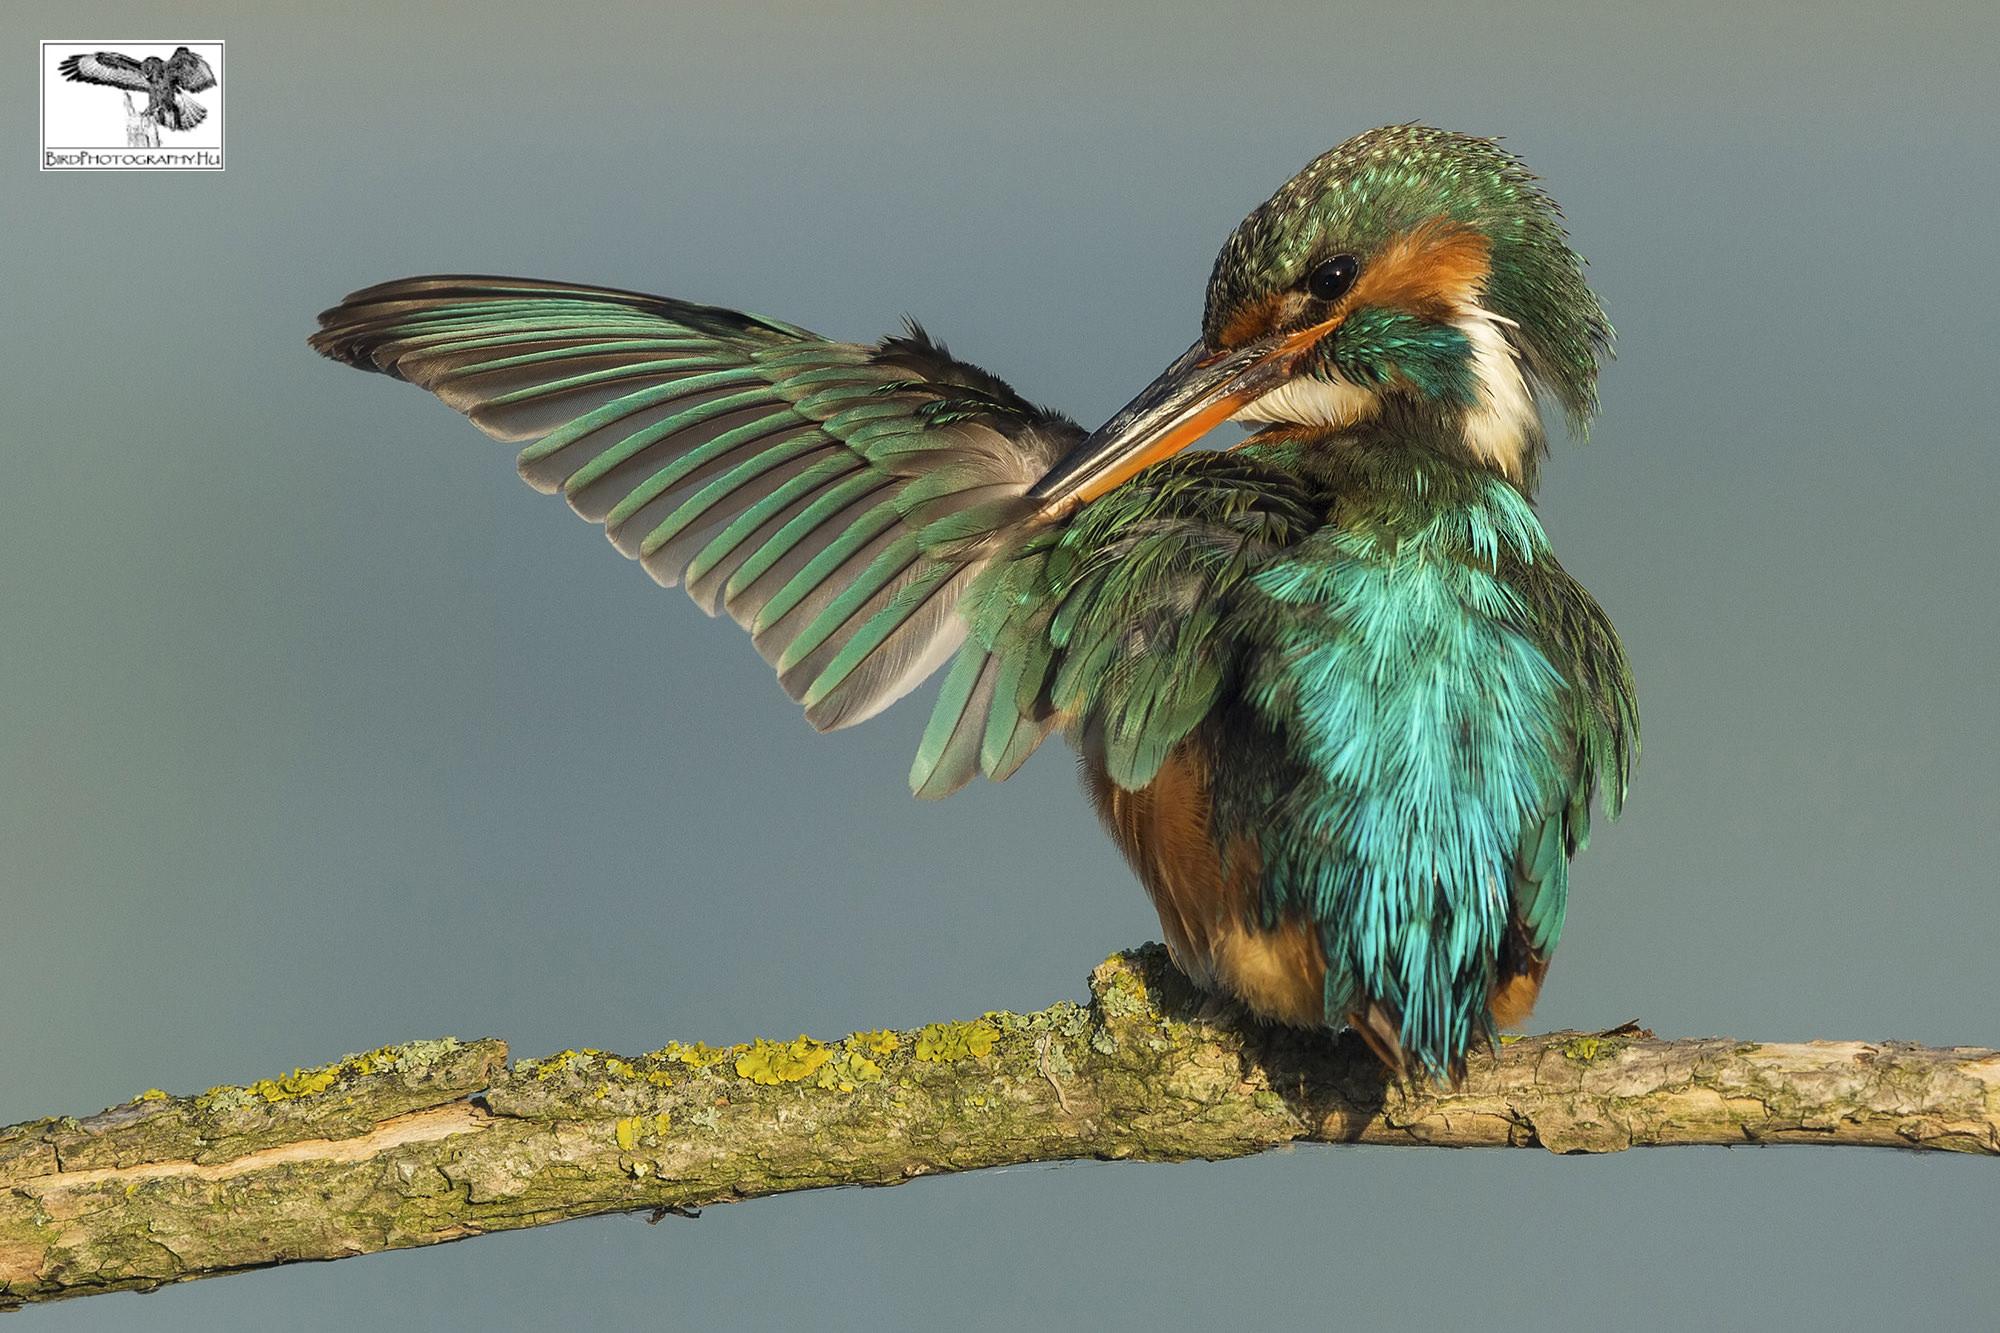 Jégmadár, Common Kingfisher, Eisvogel, Alcedo atthis